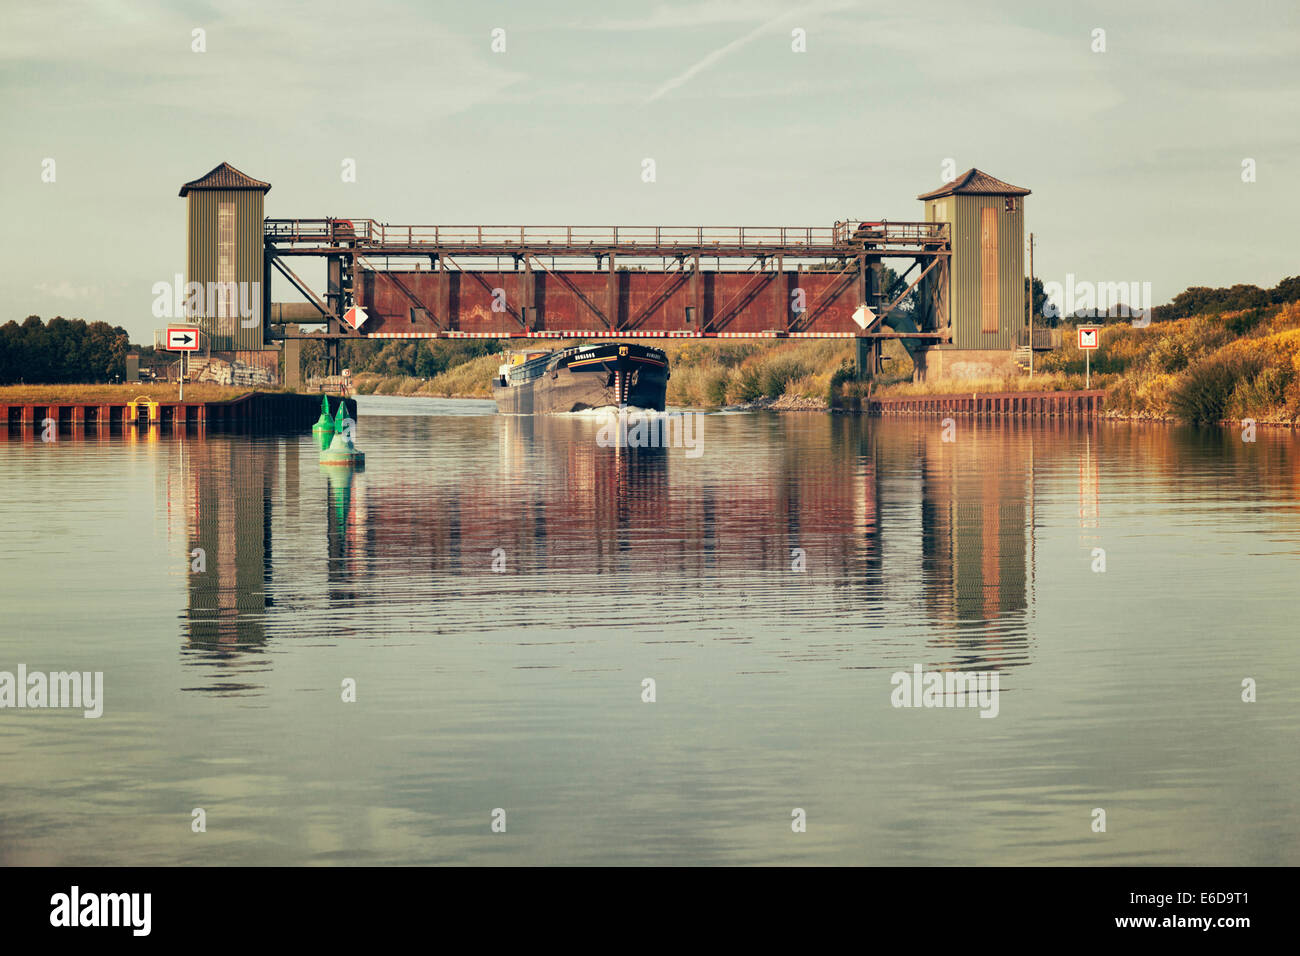 Germany, North Rhine-Westphalia, Dortmund-Ems Canal near Gelmer - Stock Image